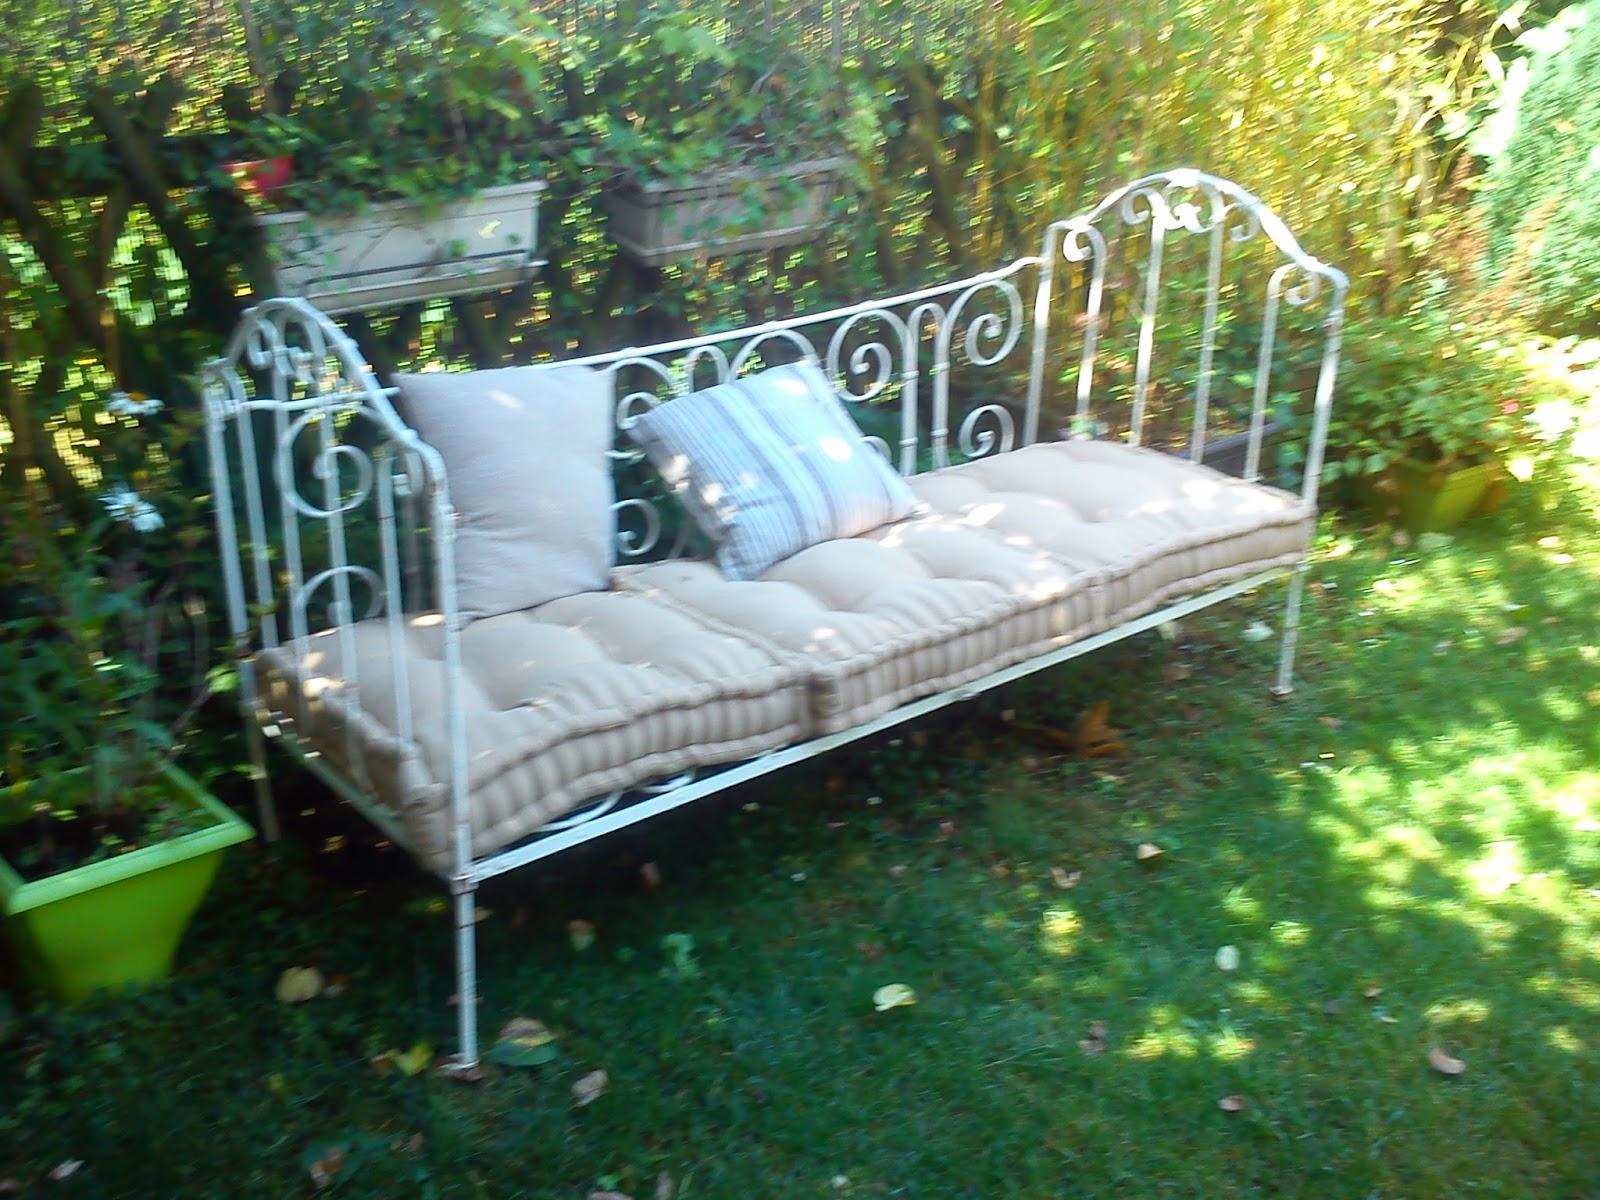 si la rose d co canap en fer forg sieste romantique. Black Bedroom Furniture Sets. Home Design Ideas